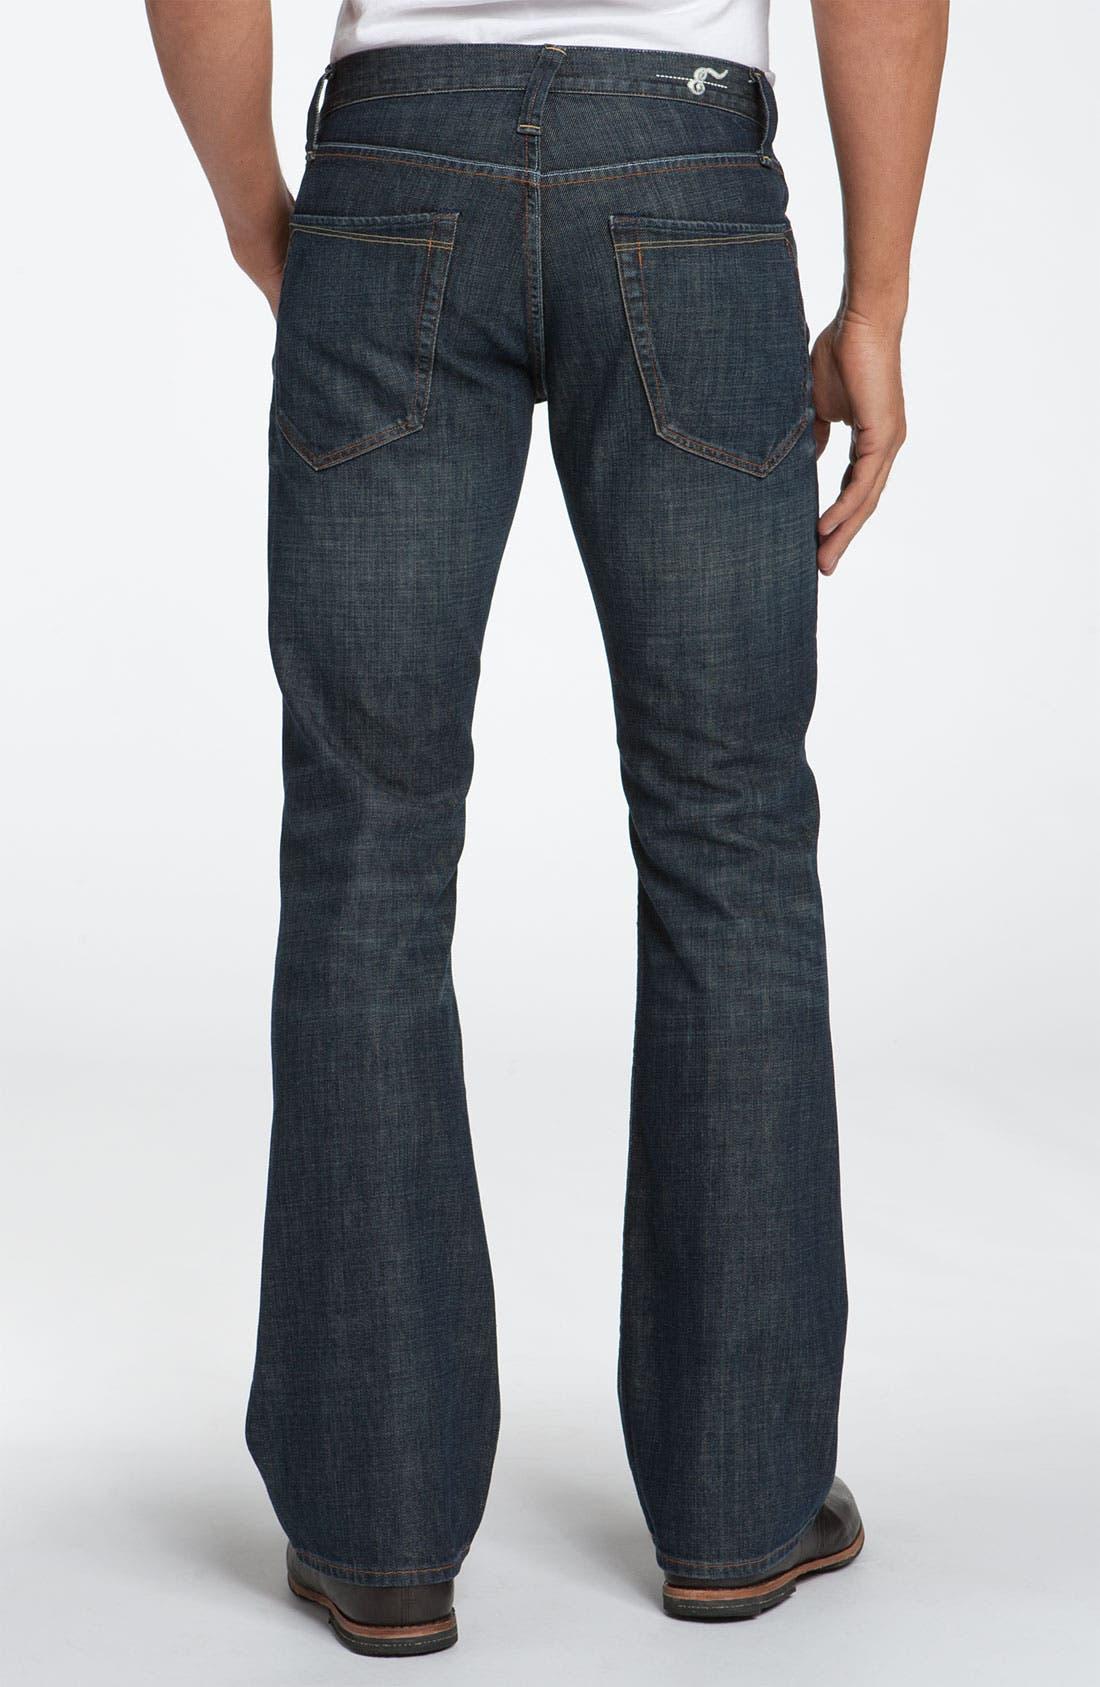 Main Image - Earnest Sewn 'Hutch' Bootcut Jeans (Maz Dark)